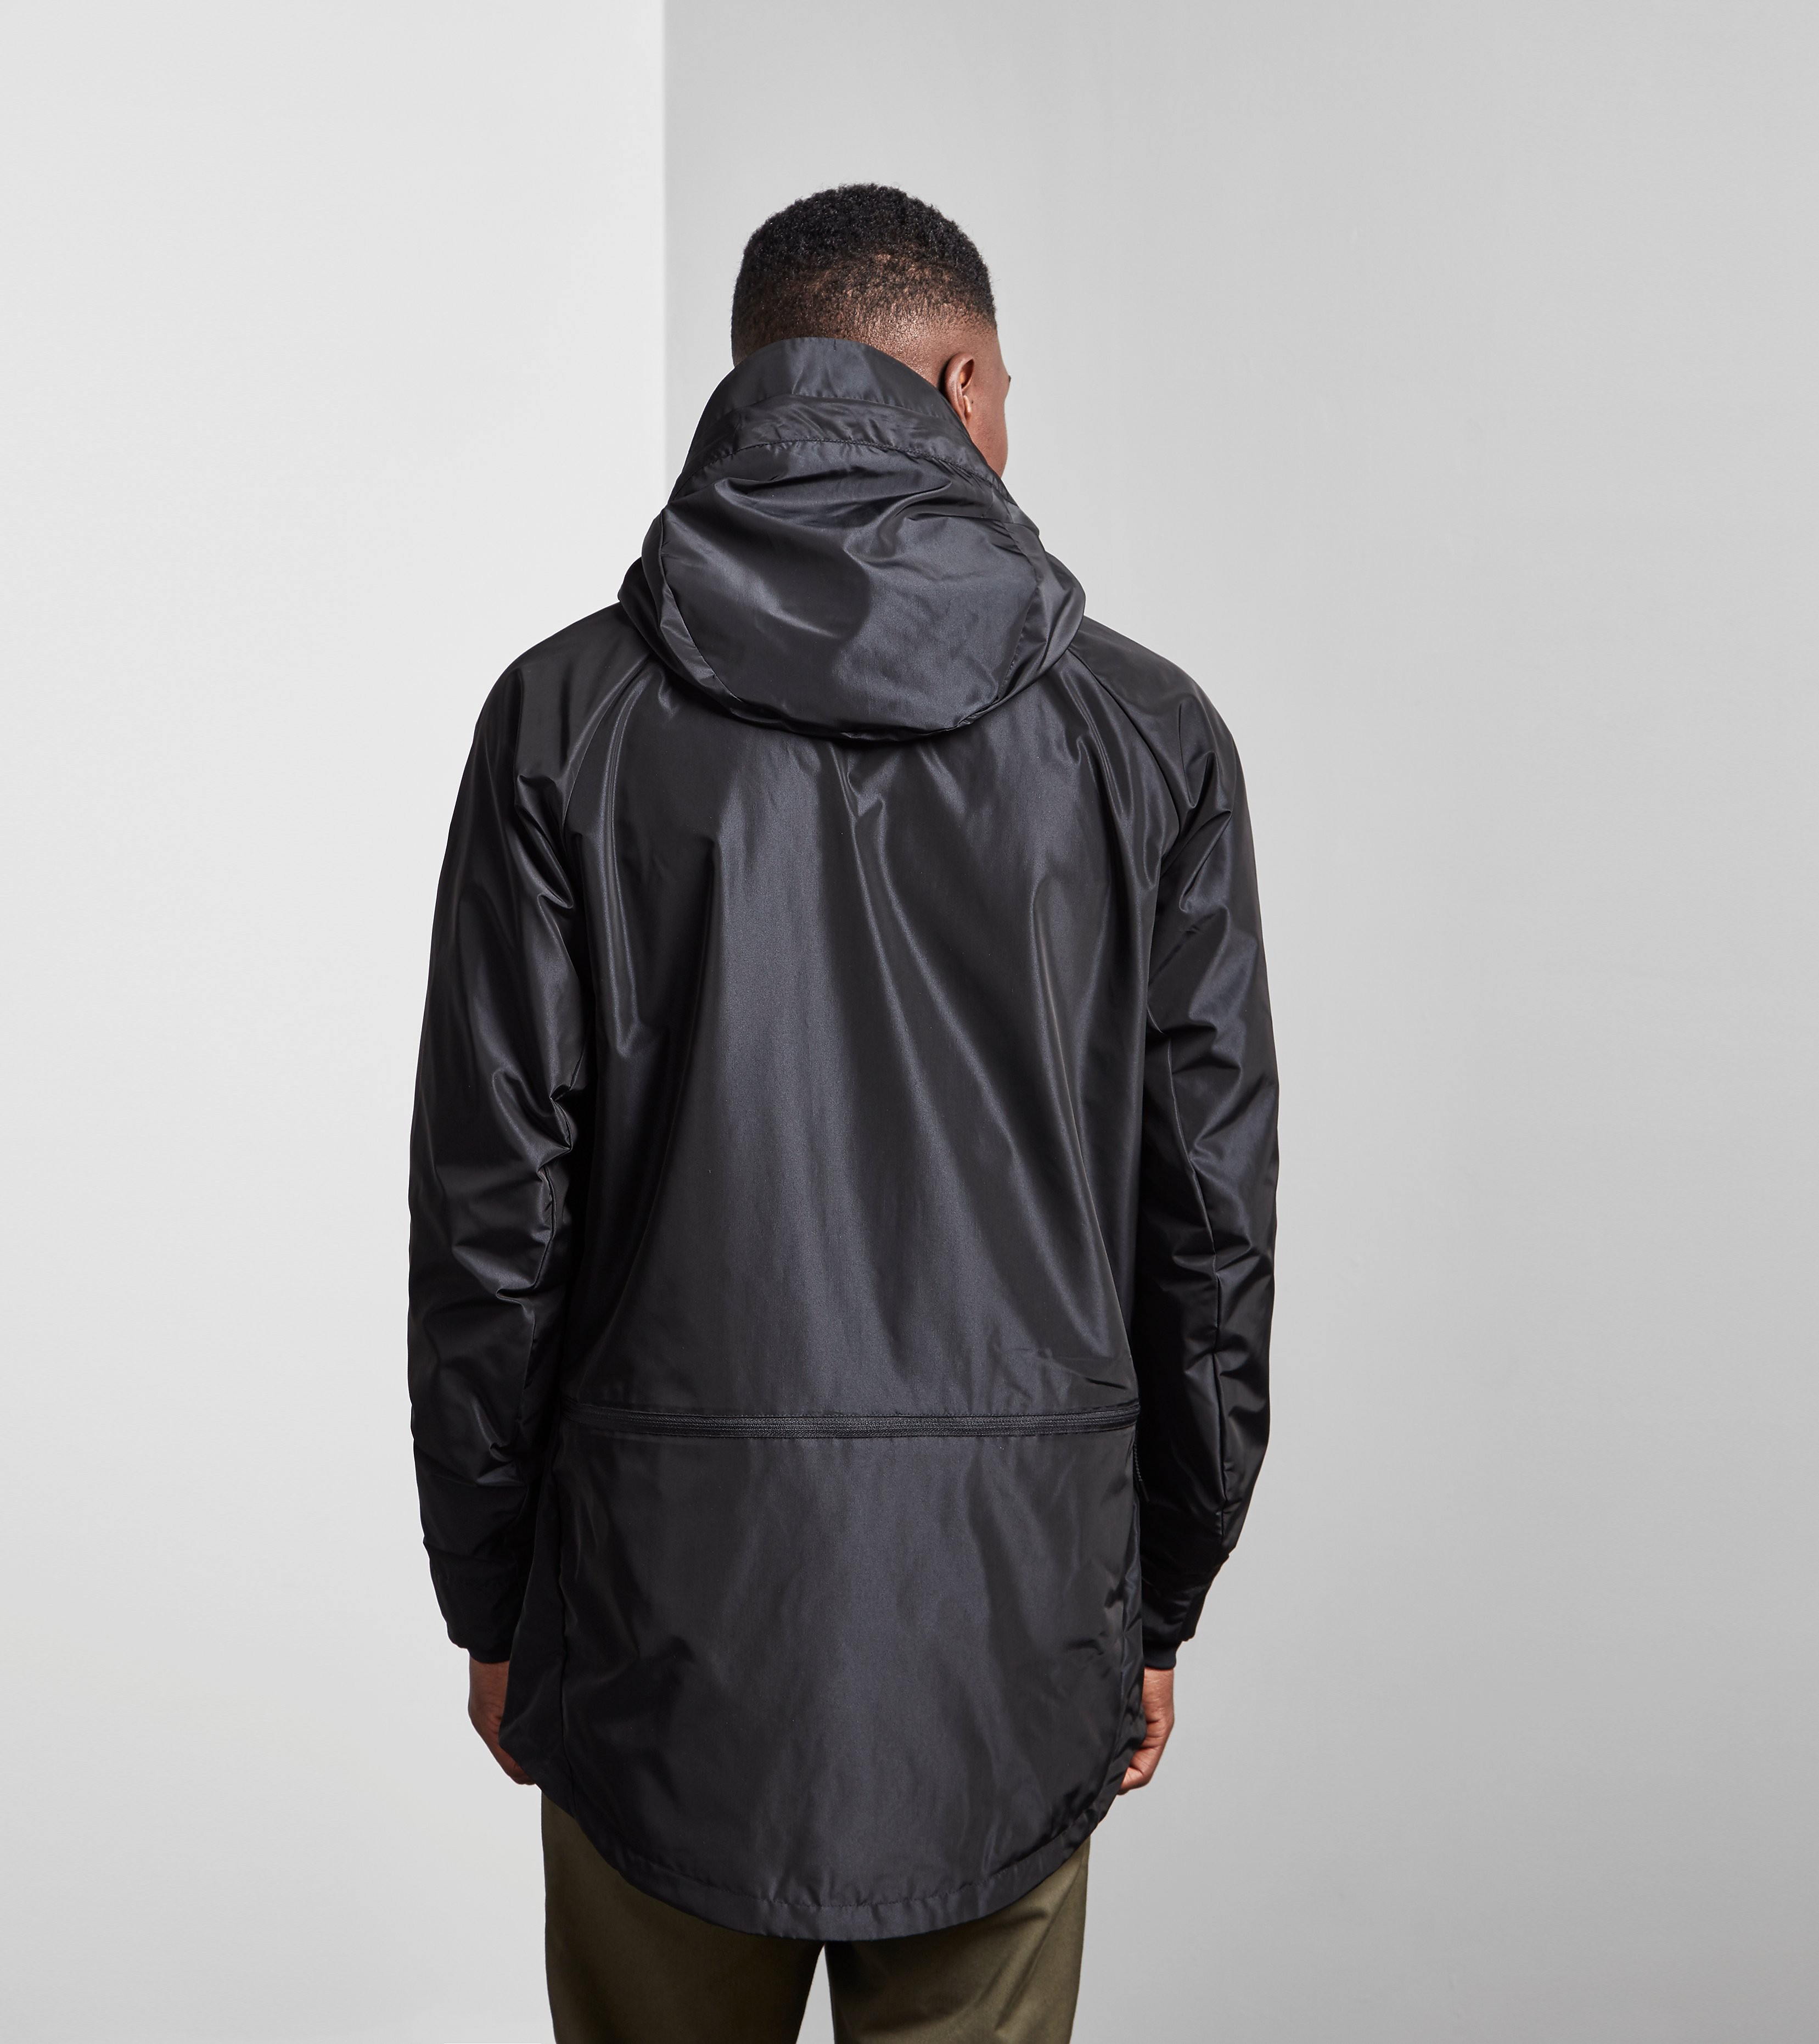 Nike Bonded Woven Parka Jacket